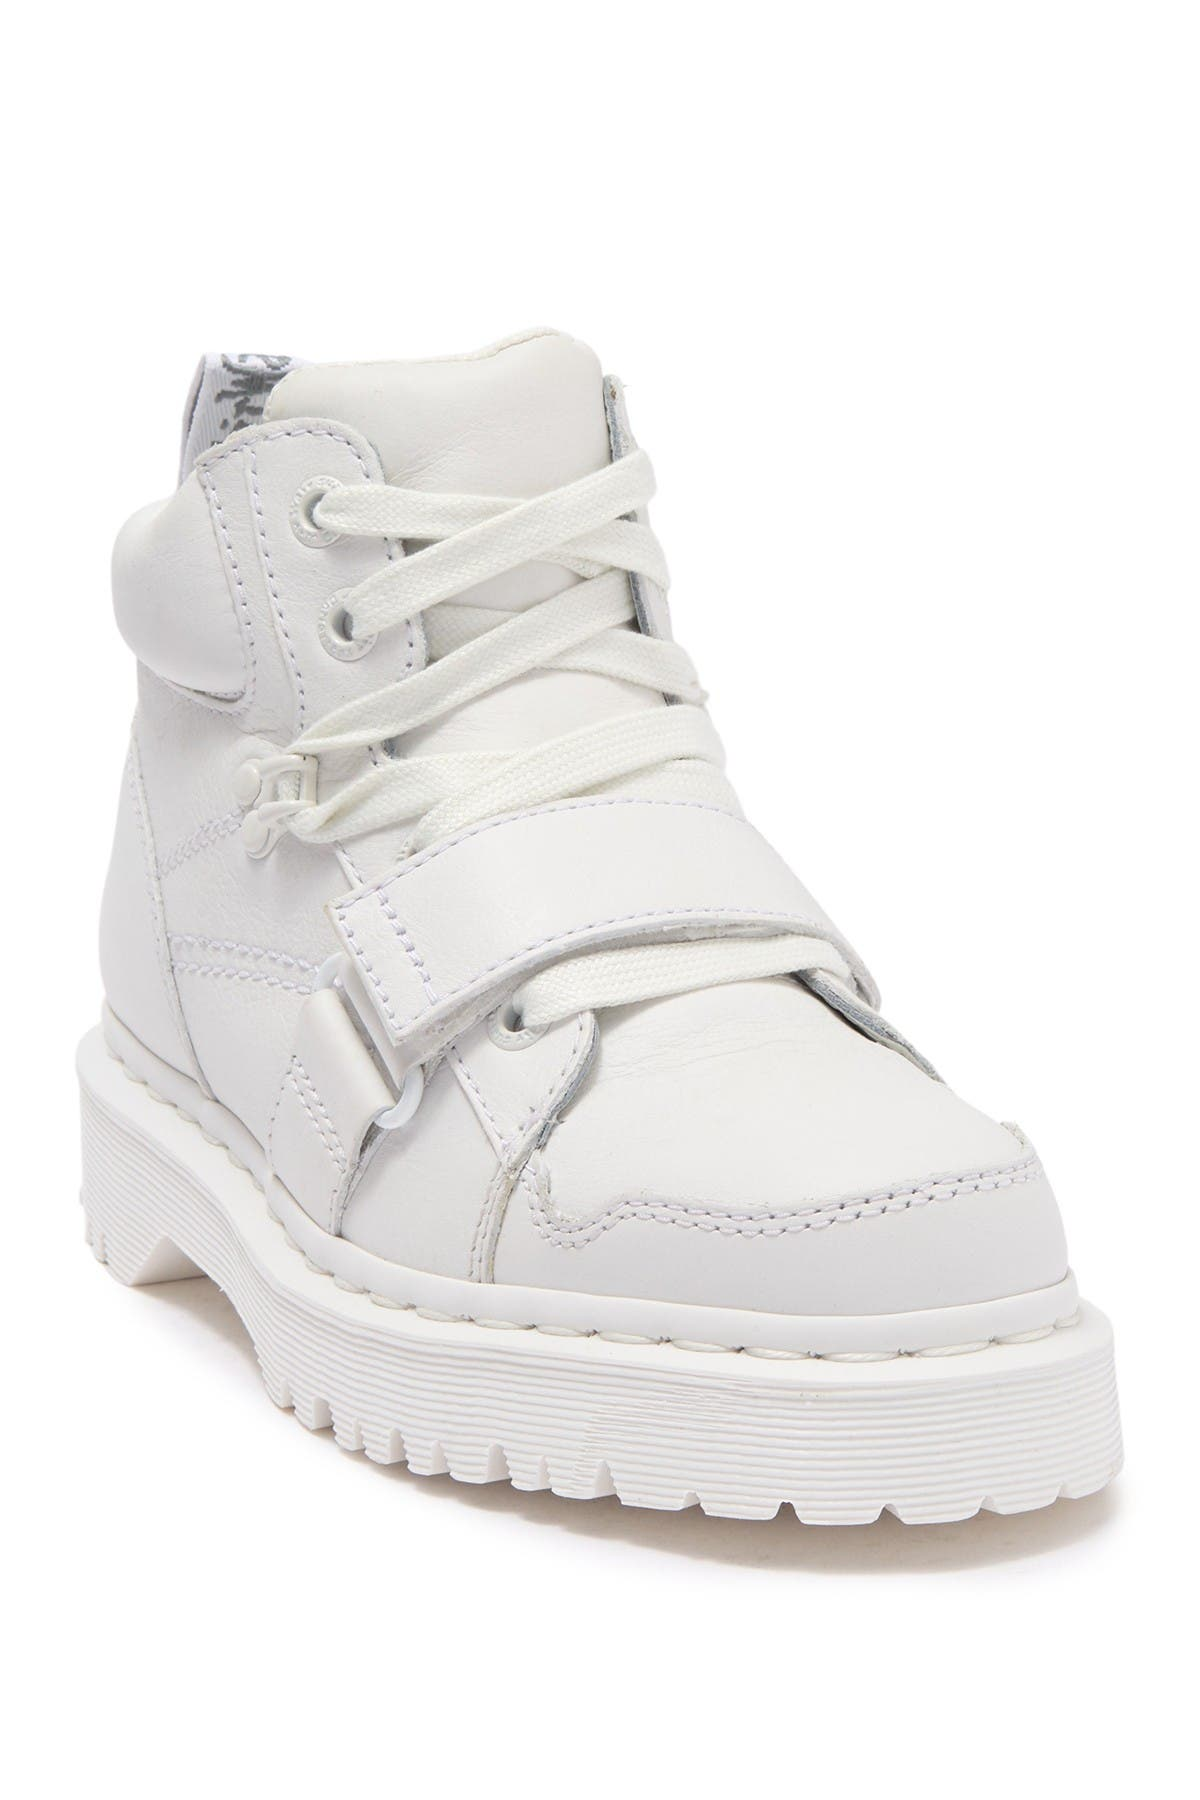 Image of Dr. Martens Zuma II High Top Sneaker